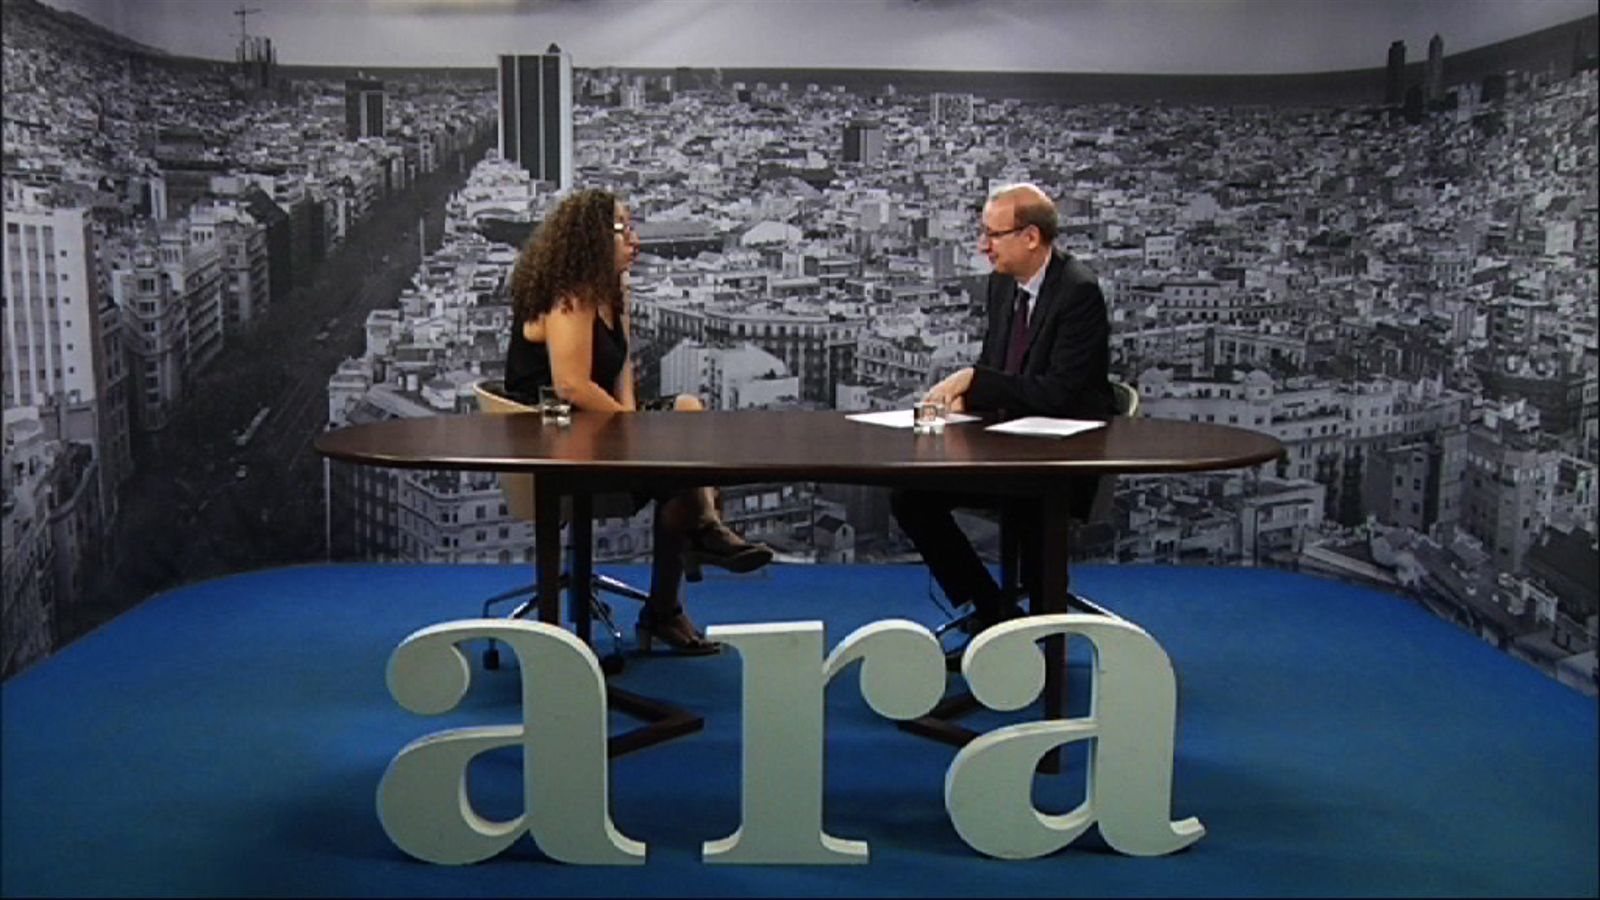 Entrevista d'Antoni Bassas a Najat El Hachmi